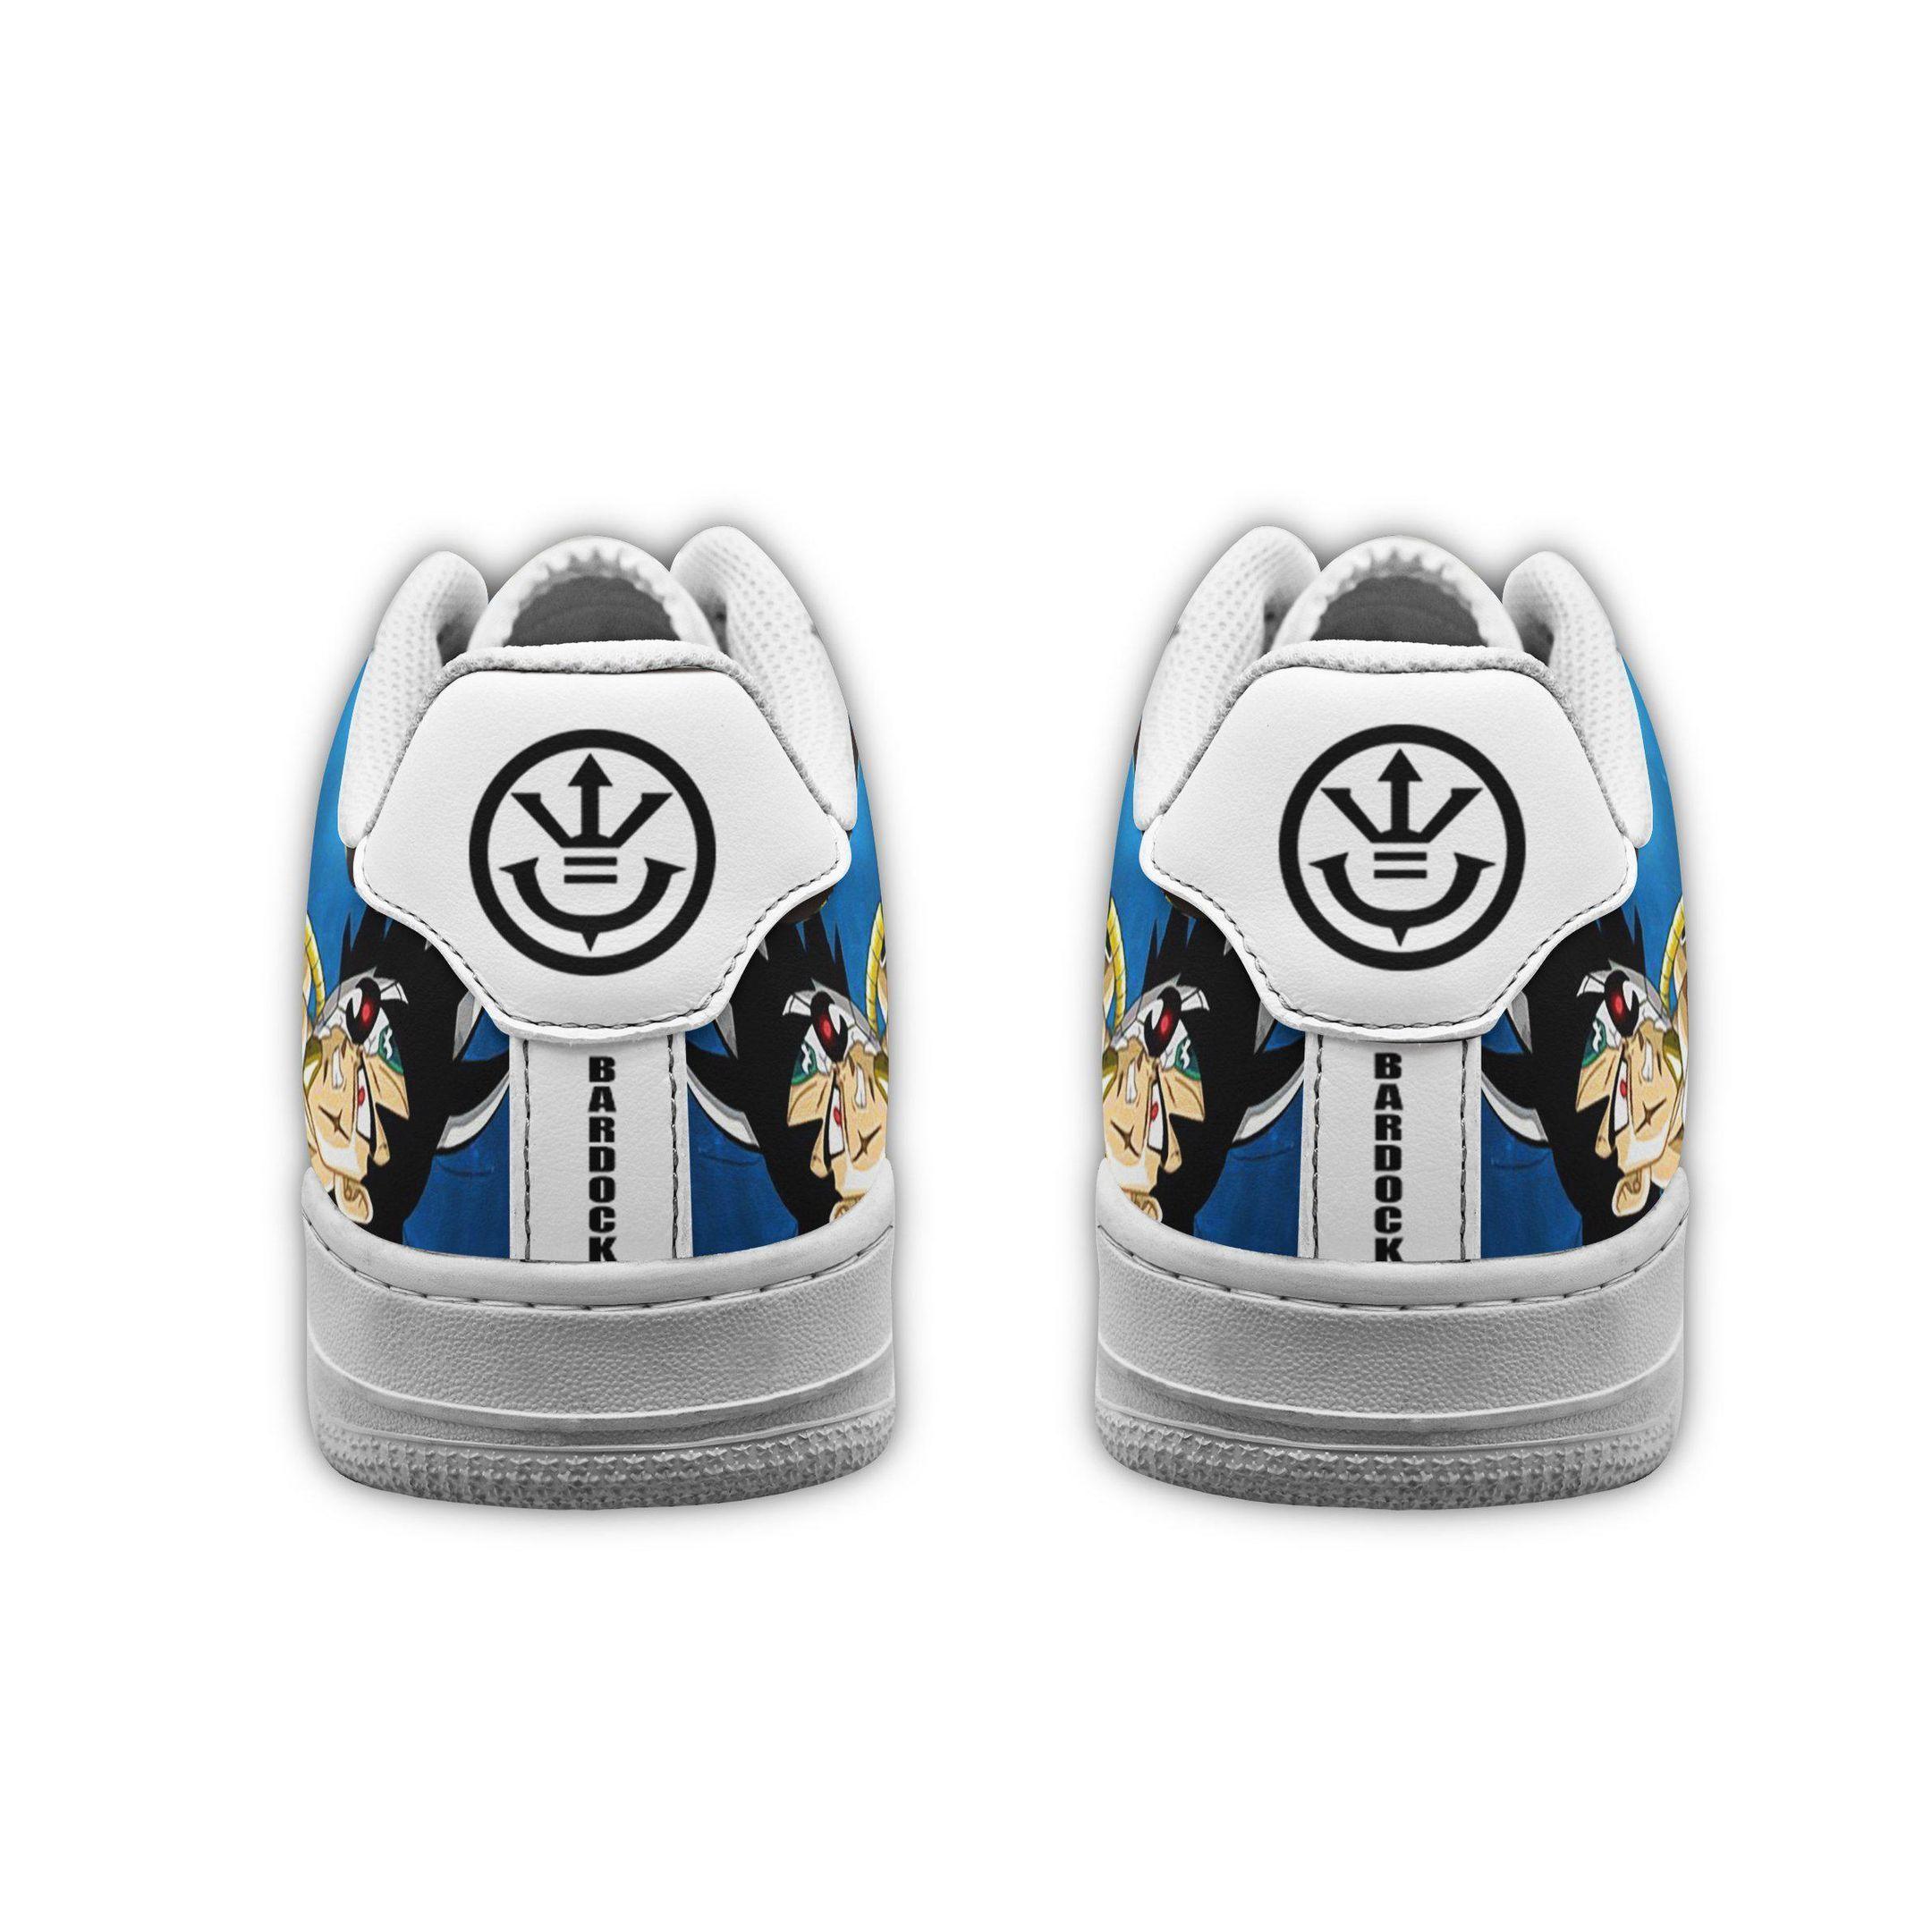 Bardock Air Shoes Dragon Ball Z Anime Shoes Fan Gift GO1012